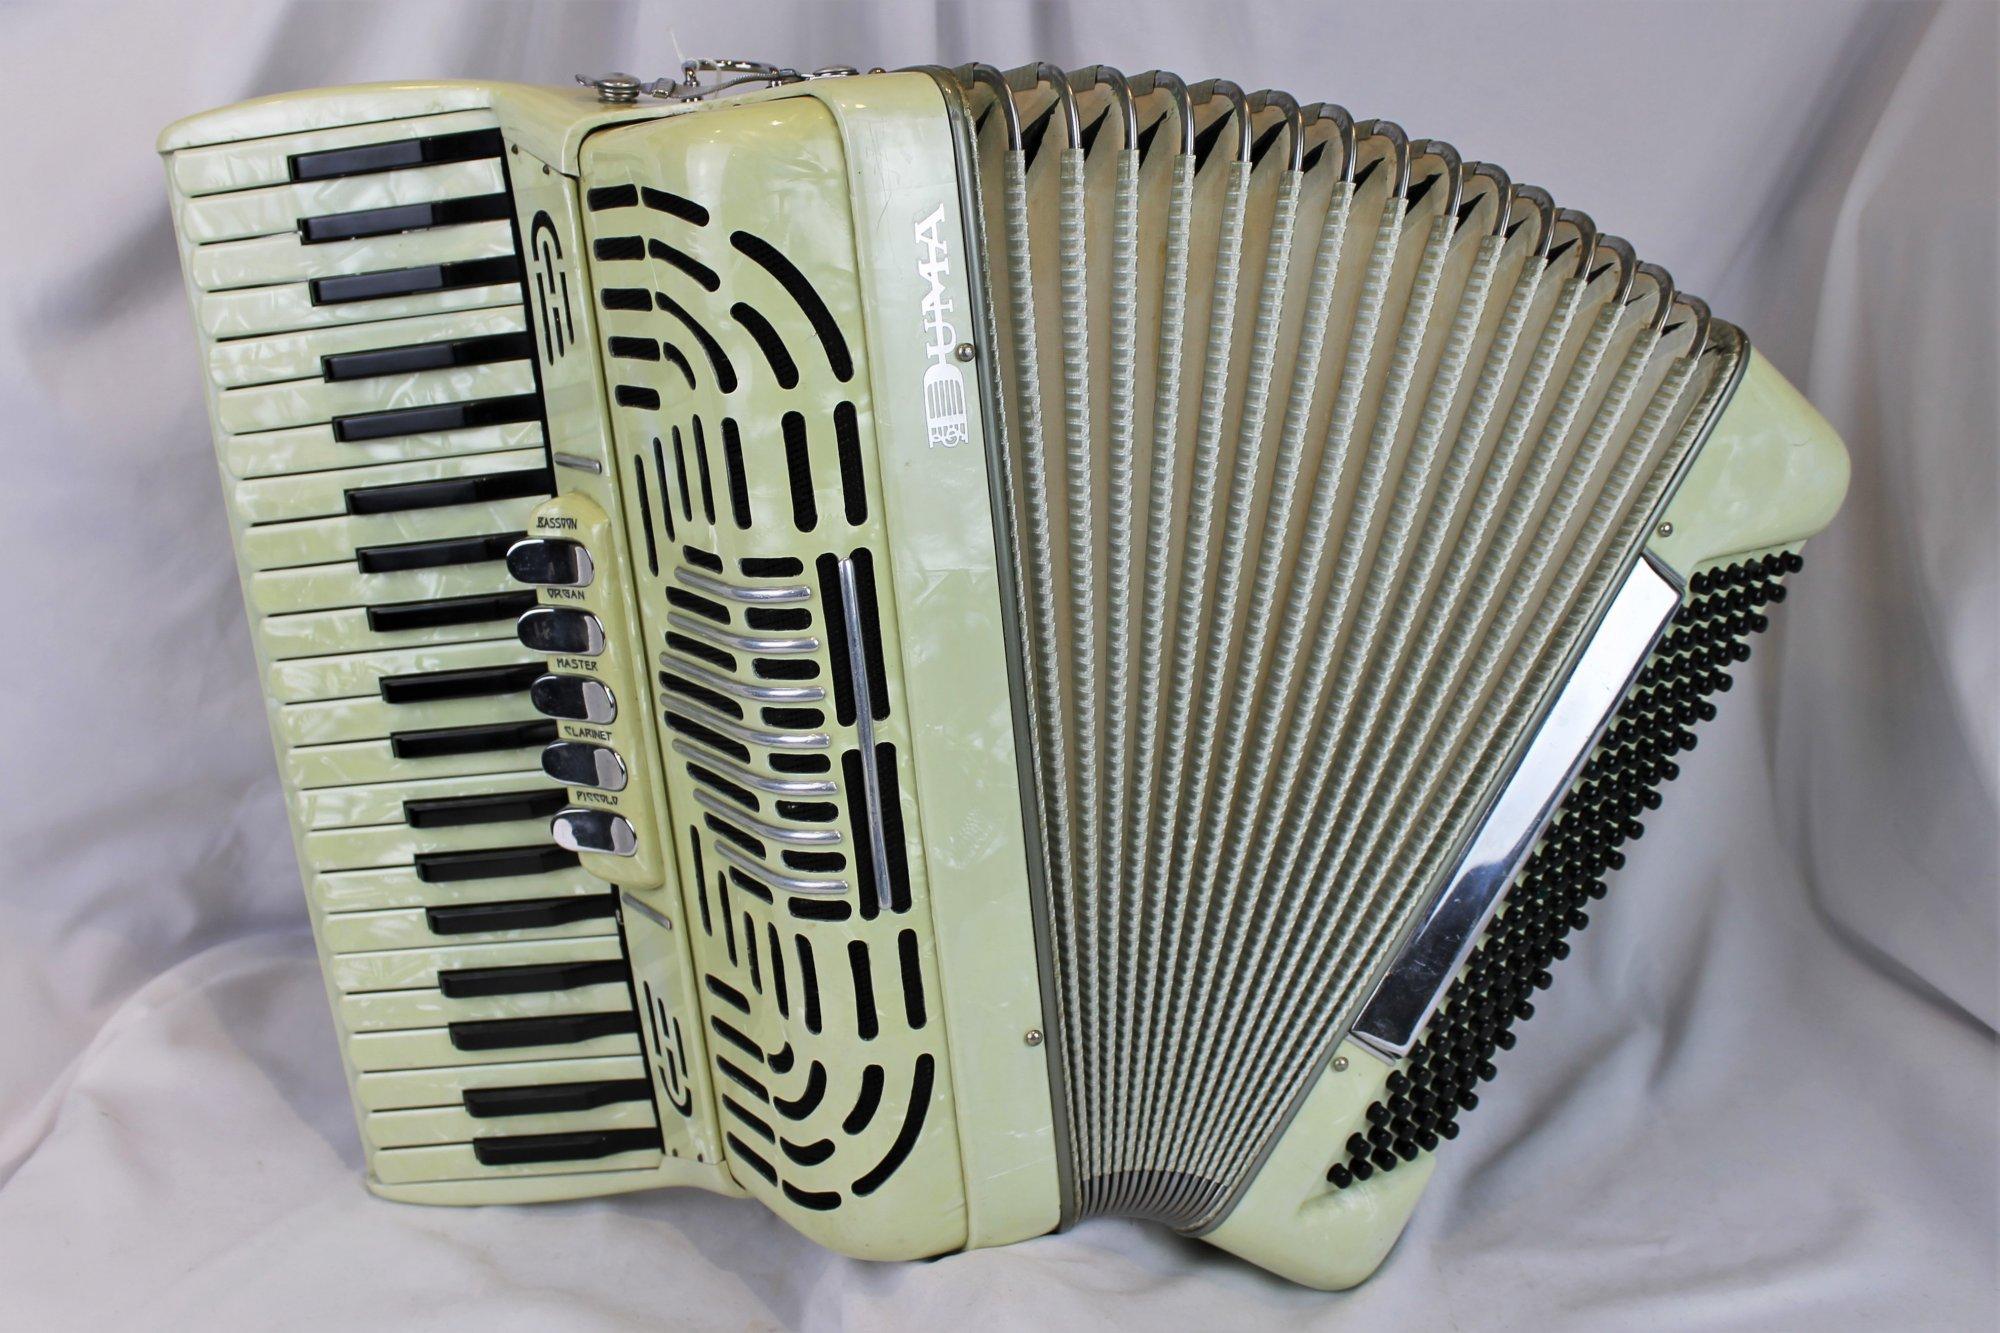 4363 - Cream Pancordion Duma Piano Accordion LMH 41 120